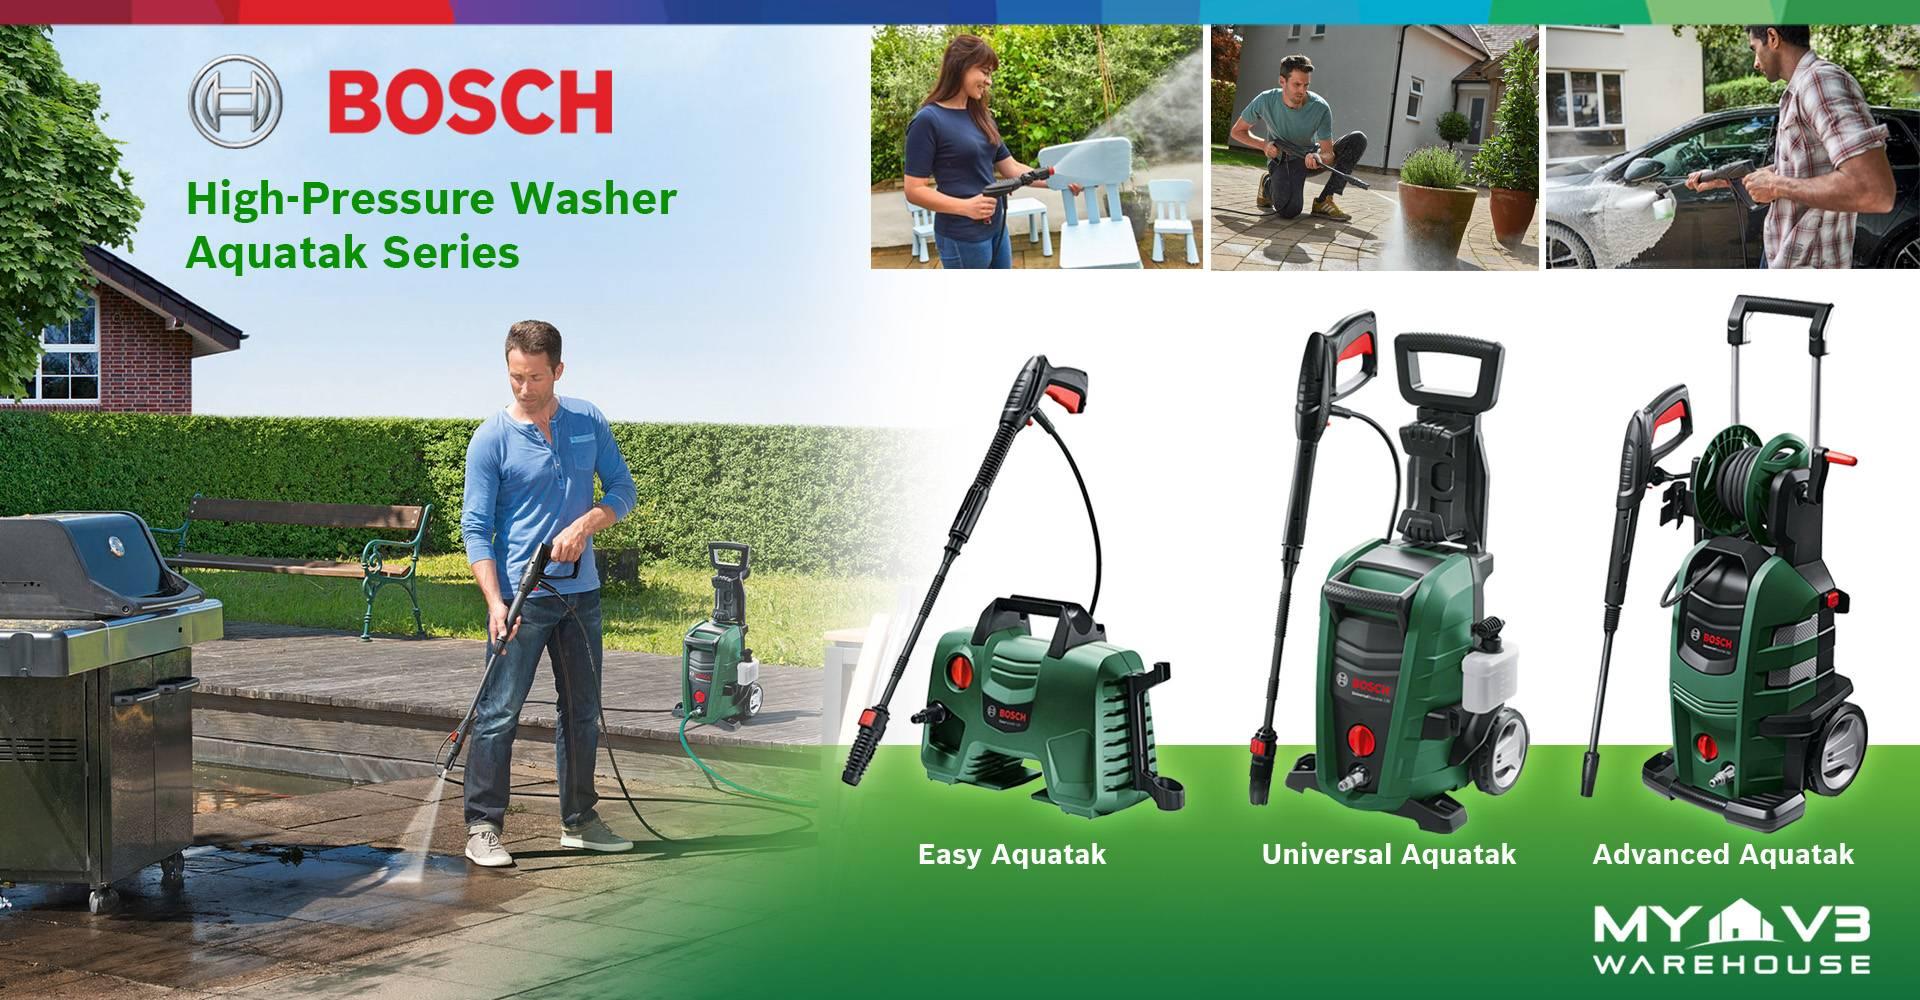 Bosch High Pressure Washer Aquatak Series